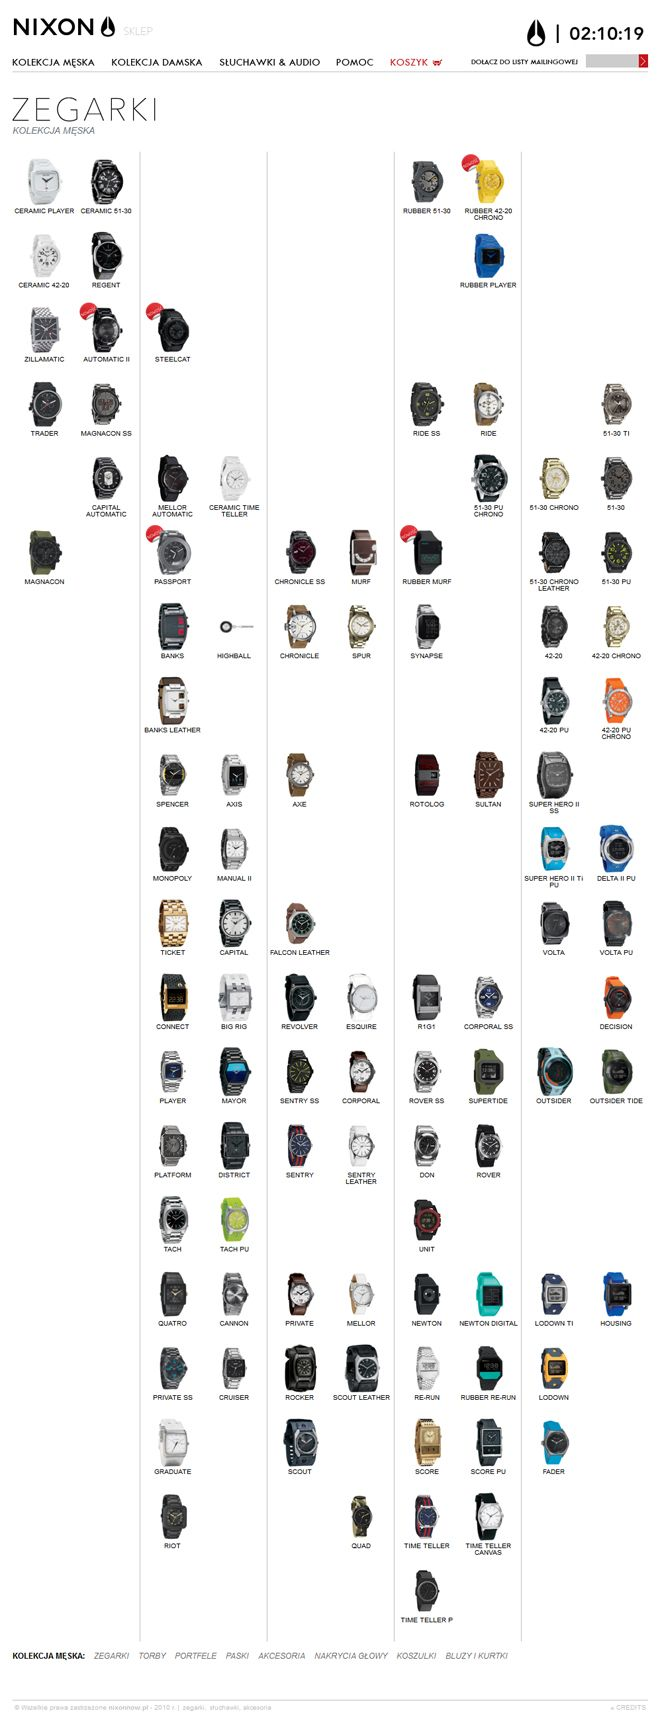 N-store website - click for more: http://www.design-pro.com.pl/nixon,56.html